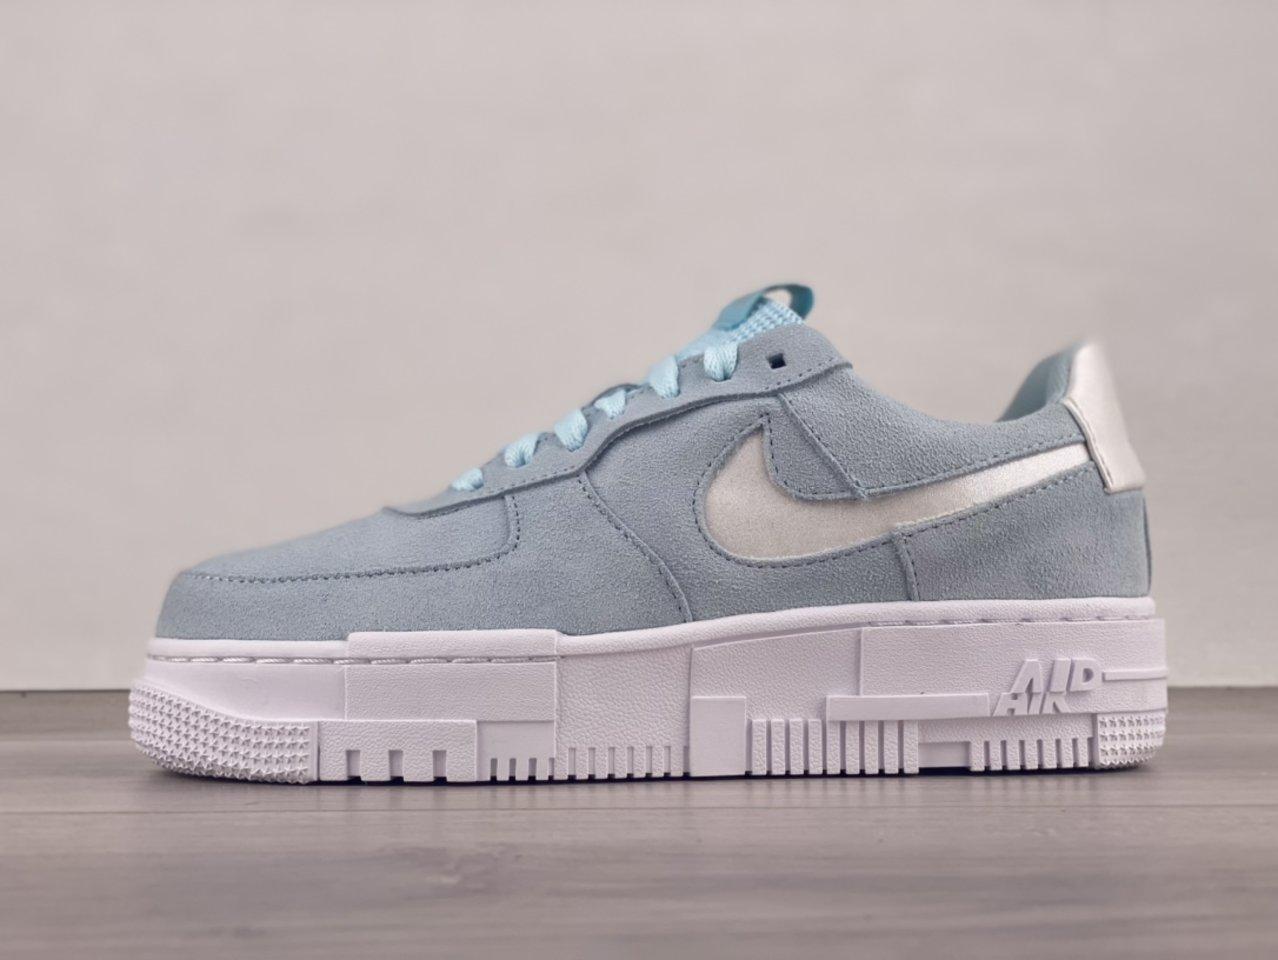 Nike Air Force 1 Pixel Glacier Blue Casual Shoes DH3855-400